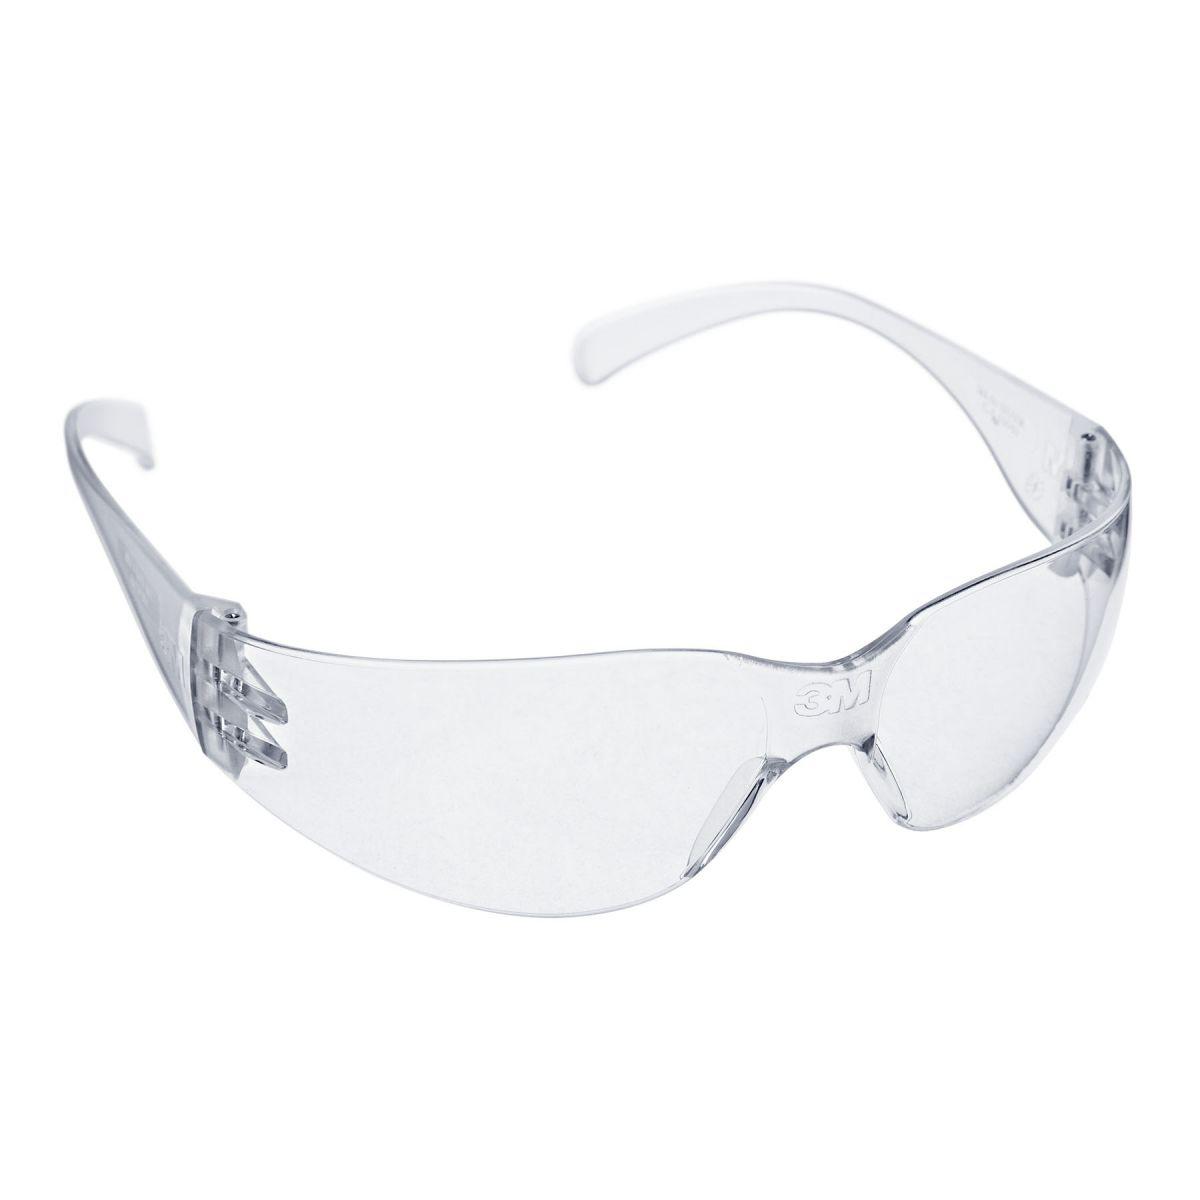 8ba067767 HidroRio - Produtos Para Estética Automotiva Óculos Virtua Lente ...